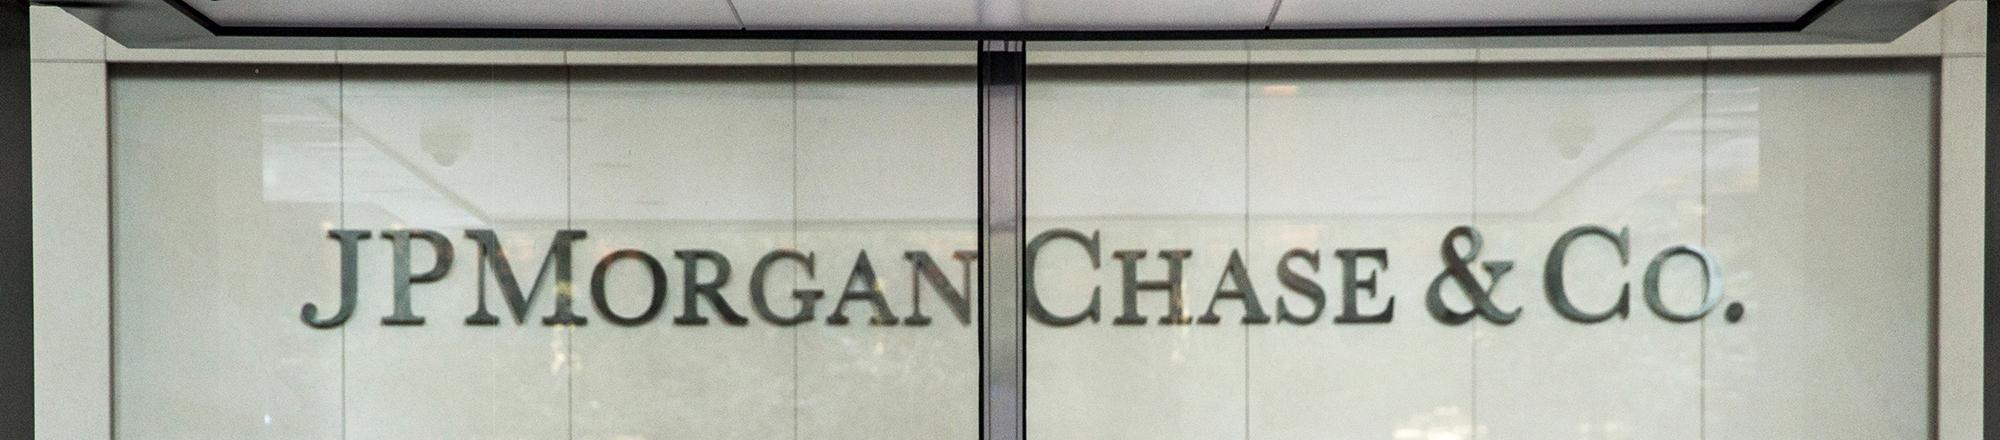 JPMorgan Chase & Co Executive Team Score | Comparably